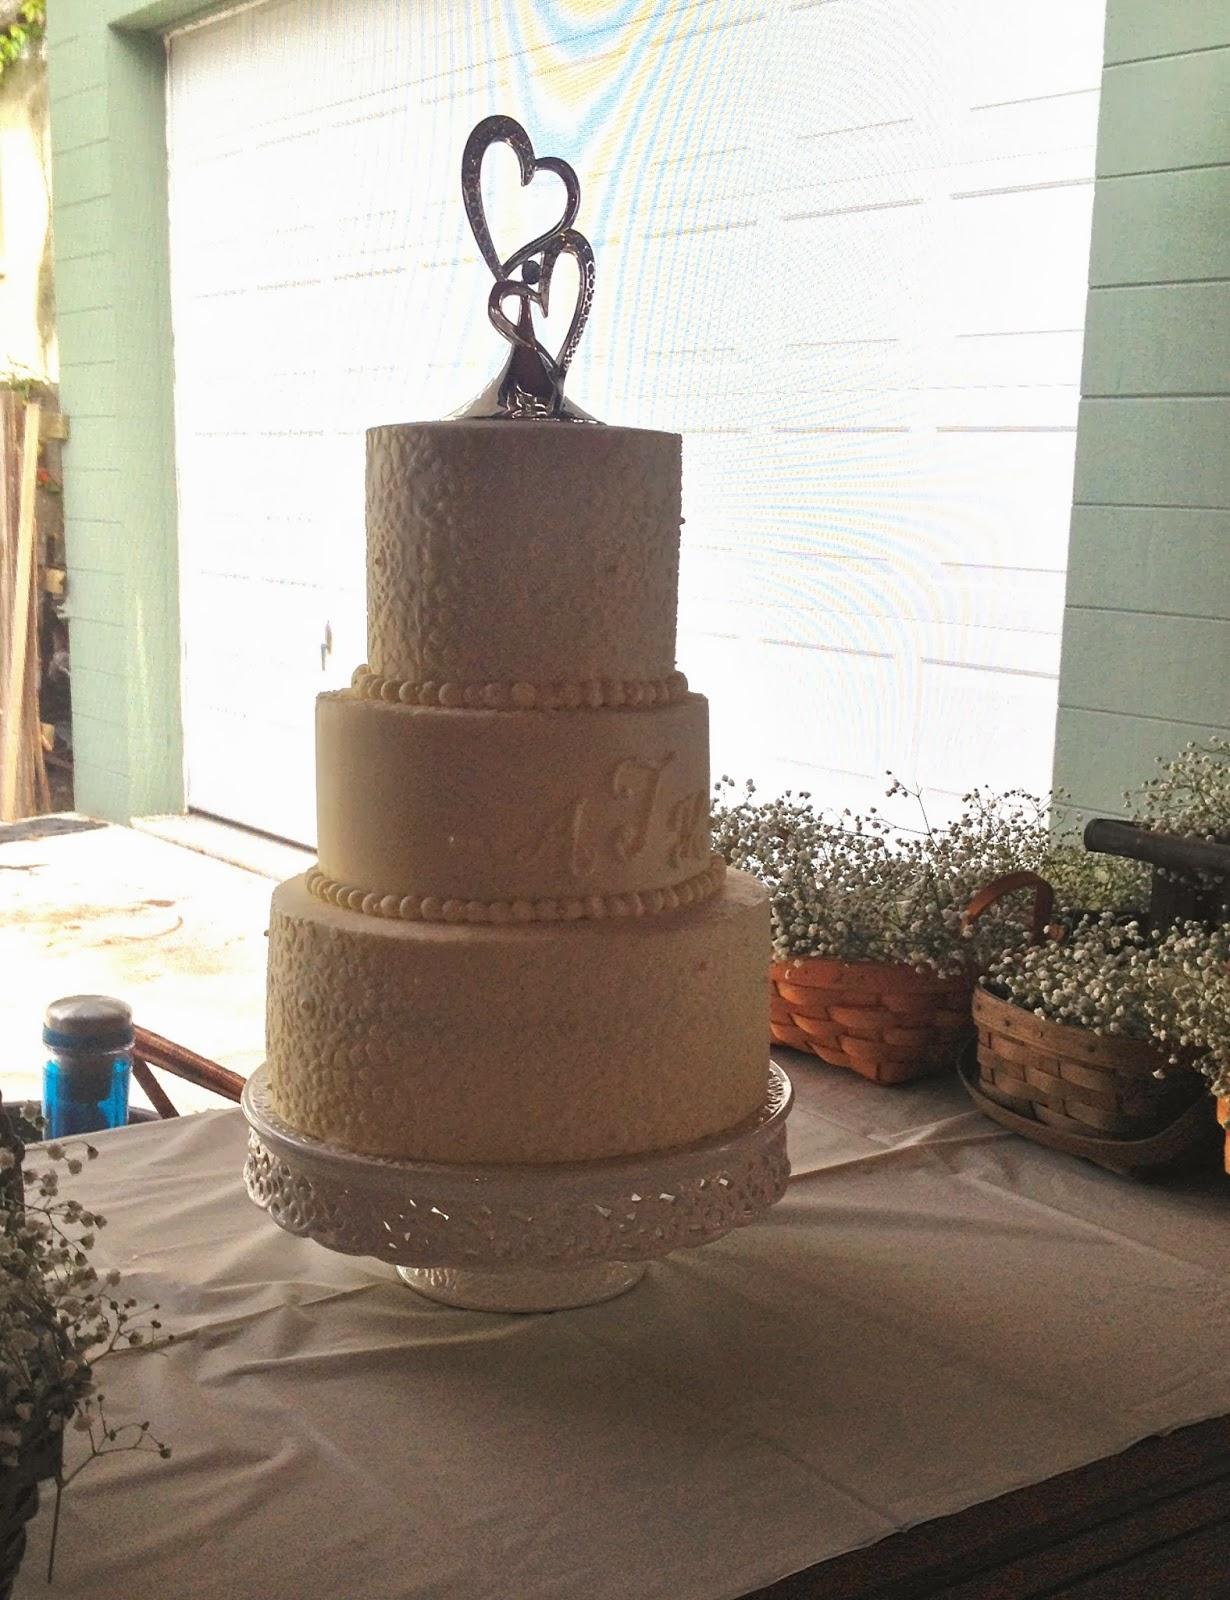 Graduation Sheet Cakes Sweet T's Cake Design:...